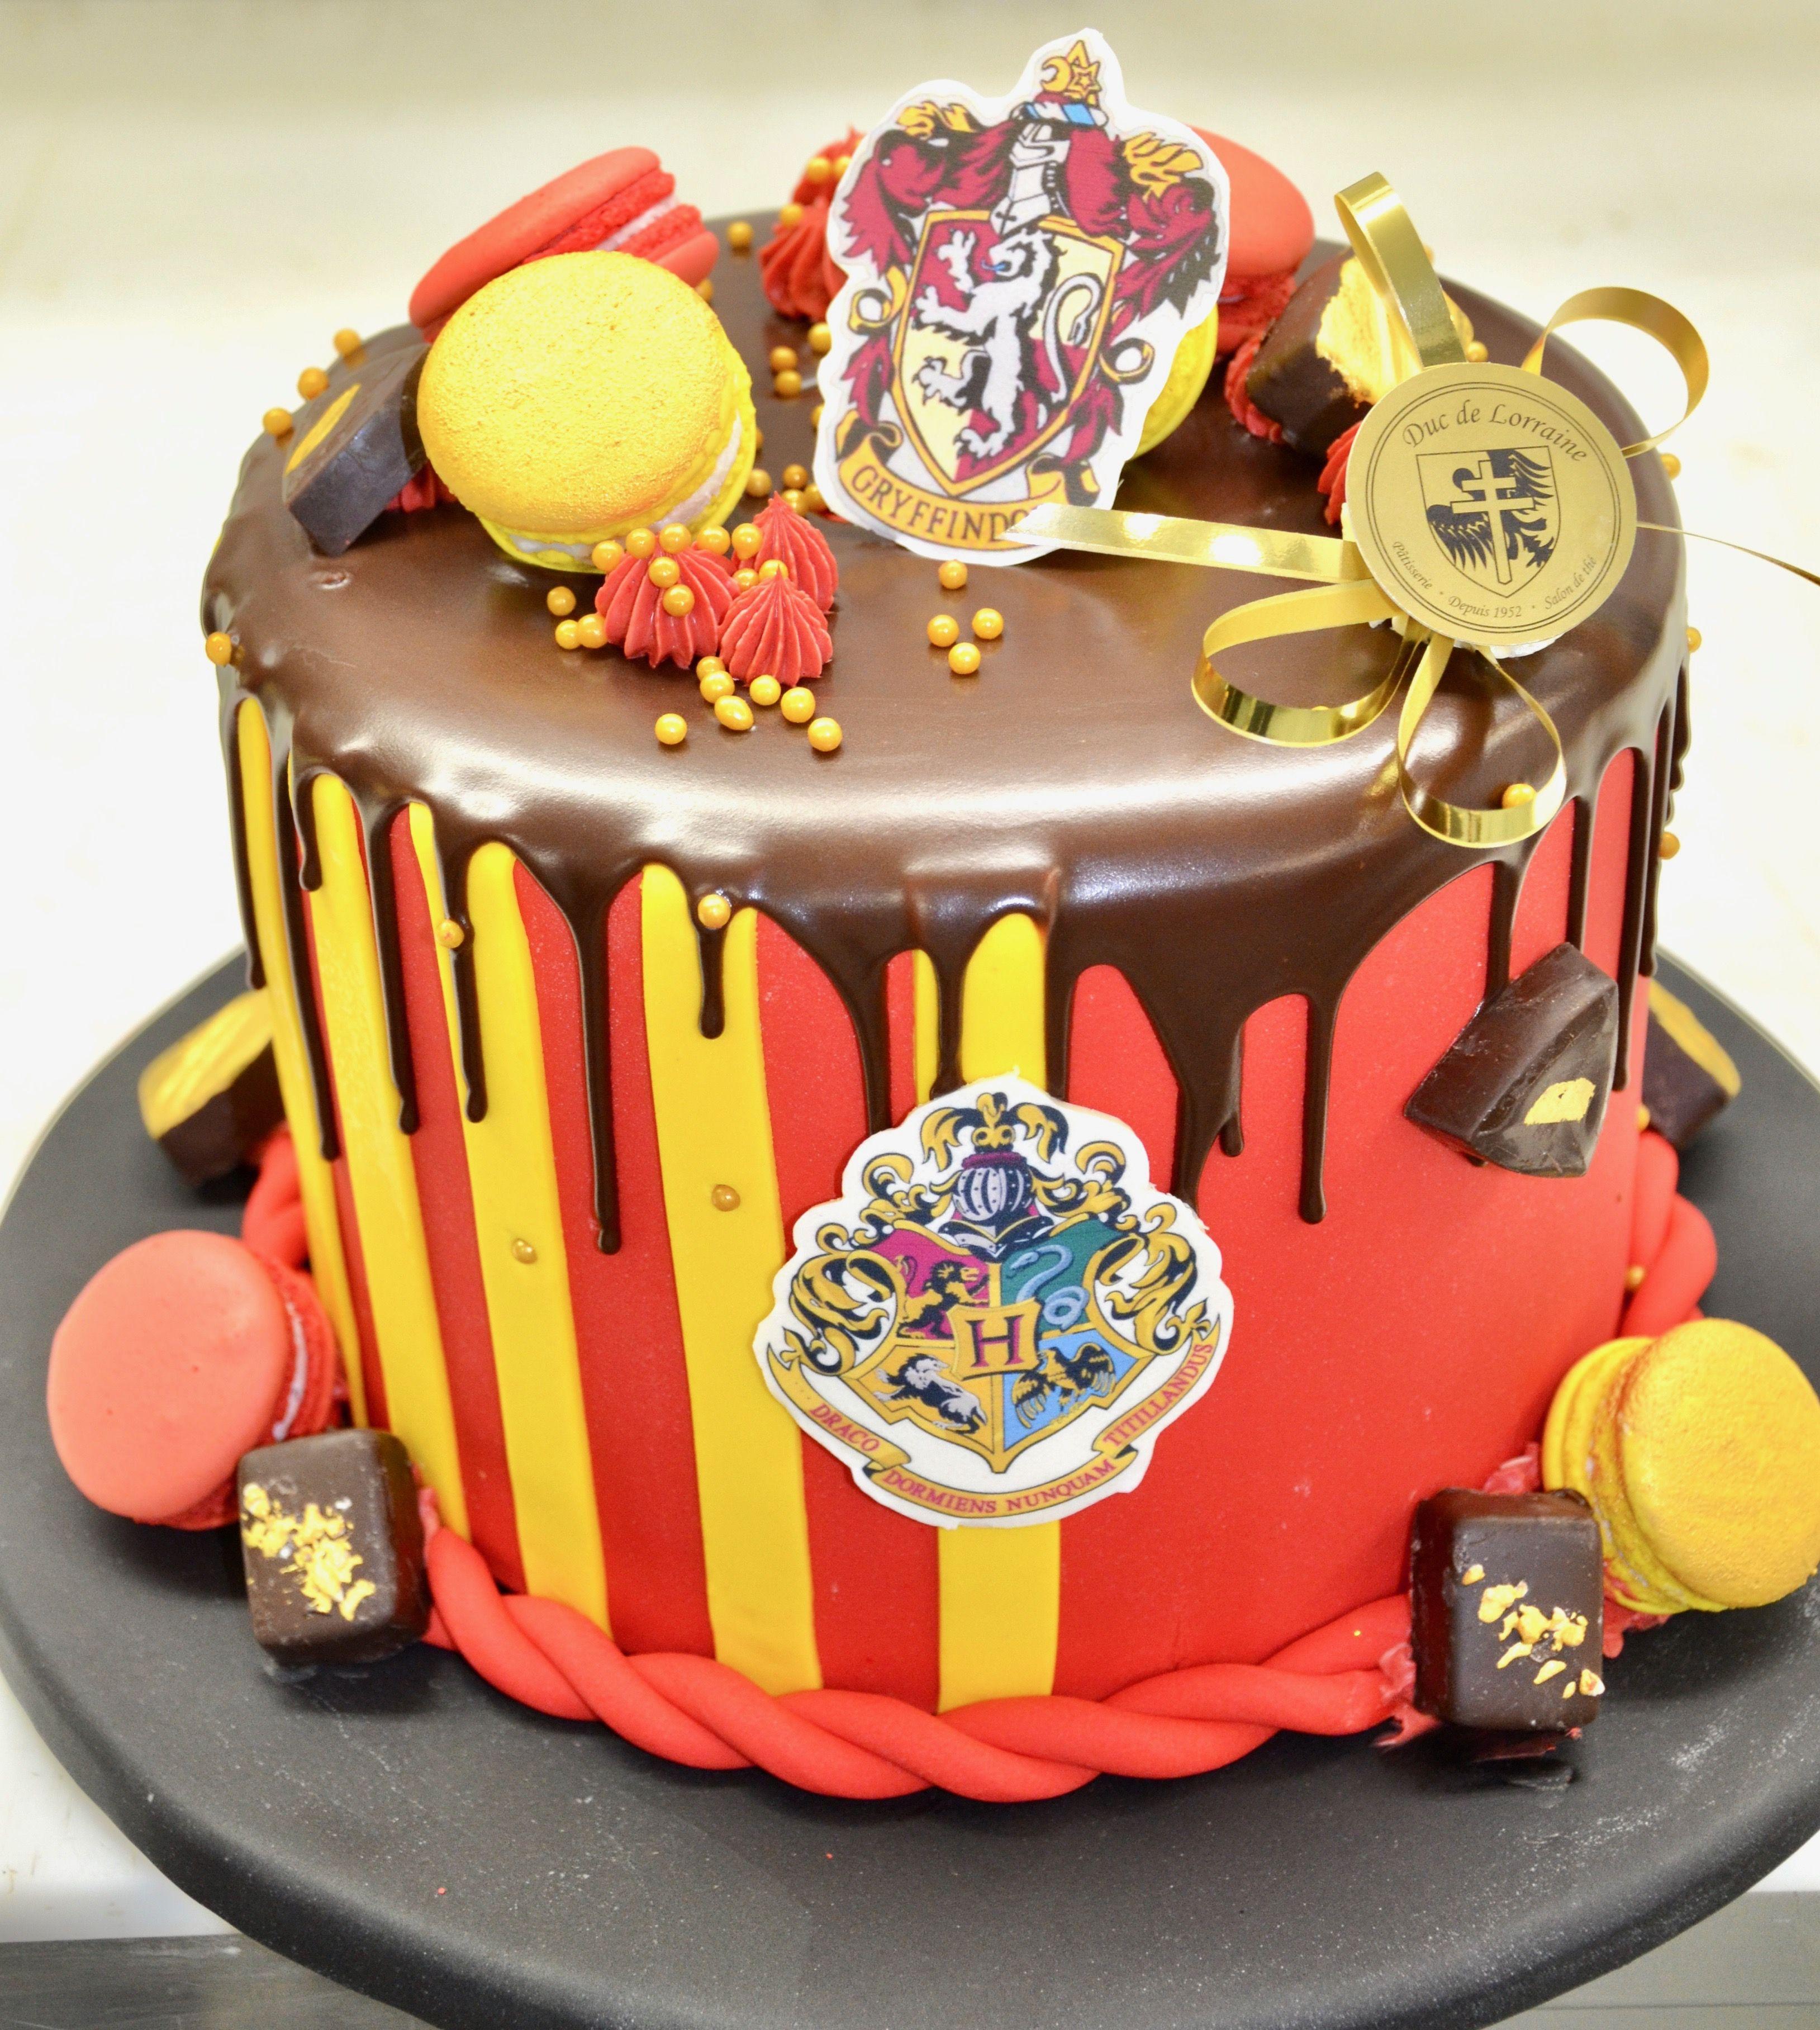 Tremendous Special Orders Custom Cakes Custom Birthday Cakes Cake Funny Birthday Cards Online Benoljebrpdamsfinfo